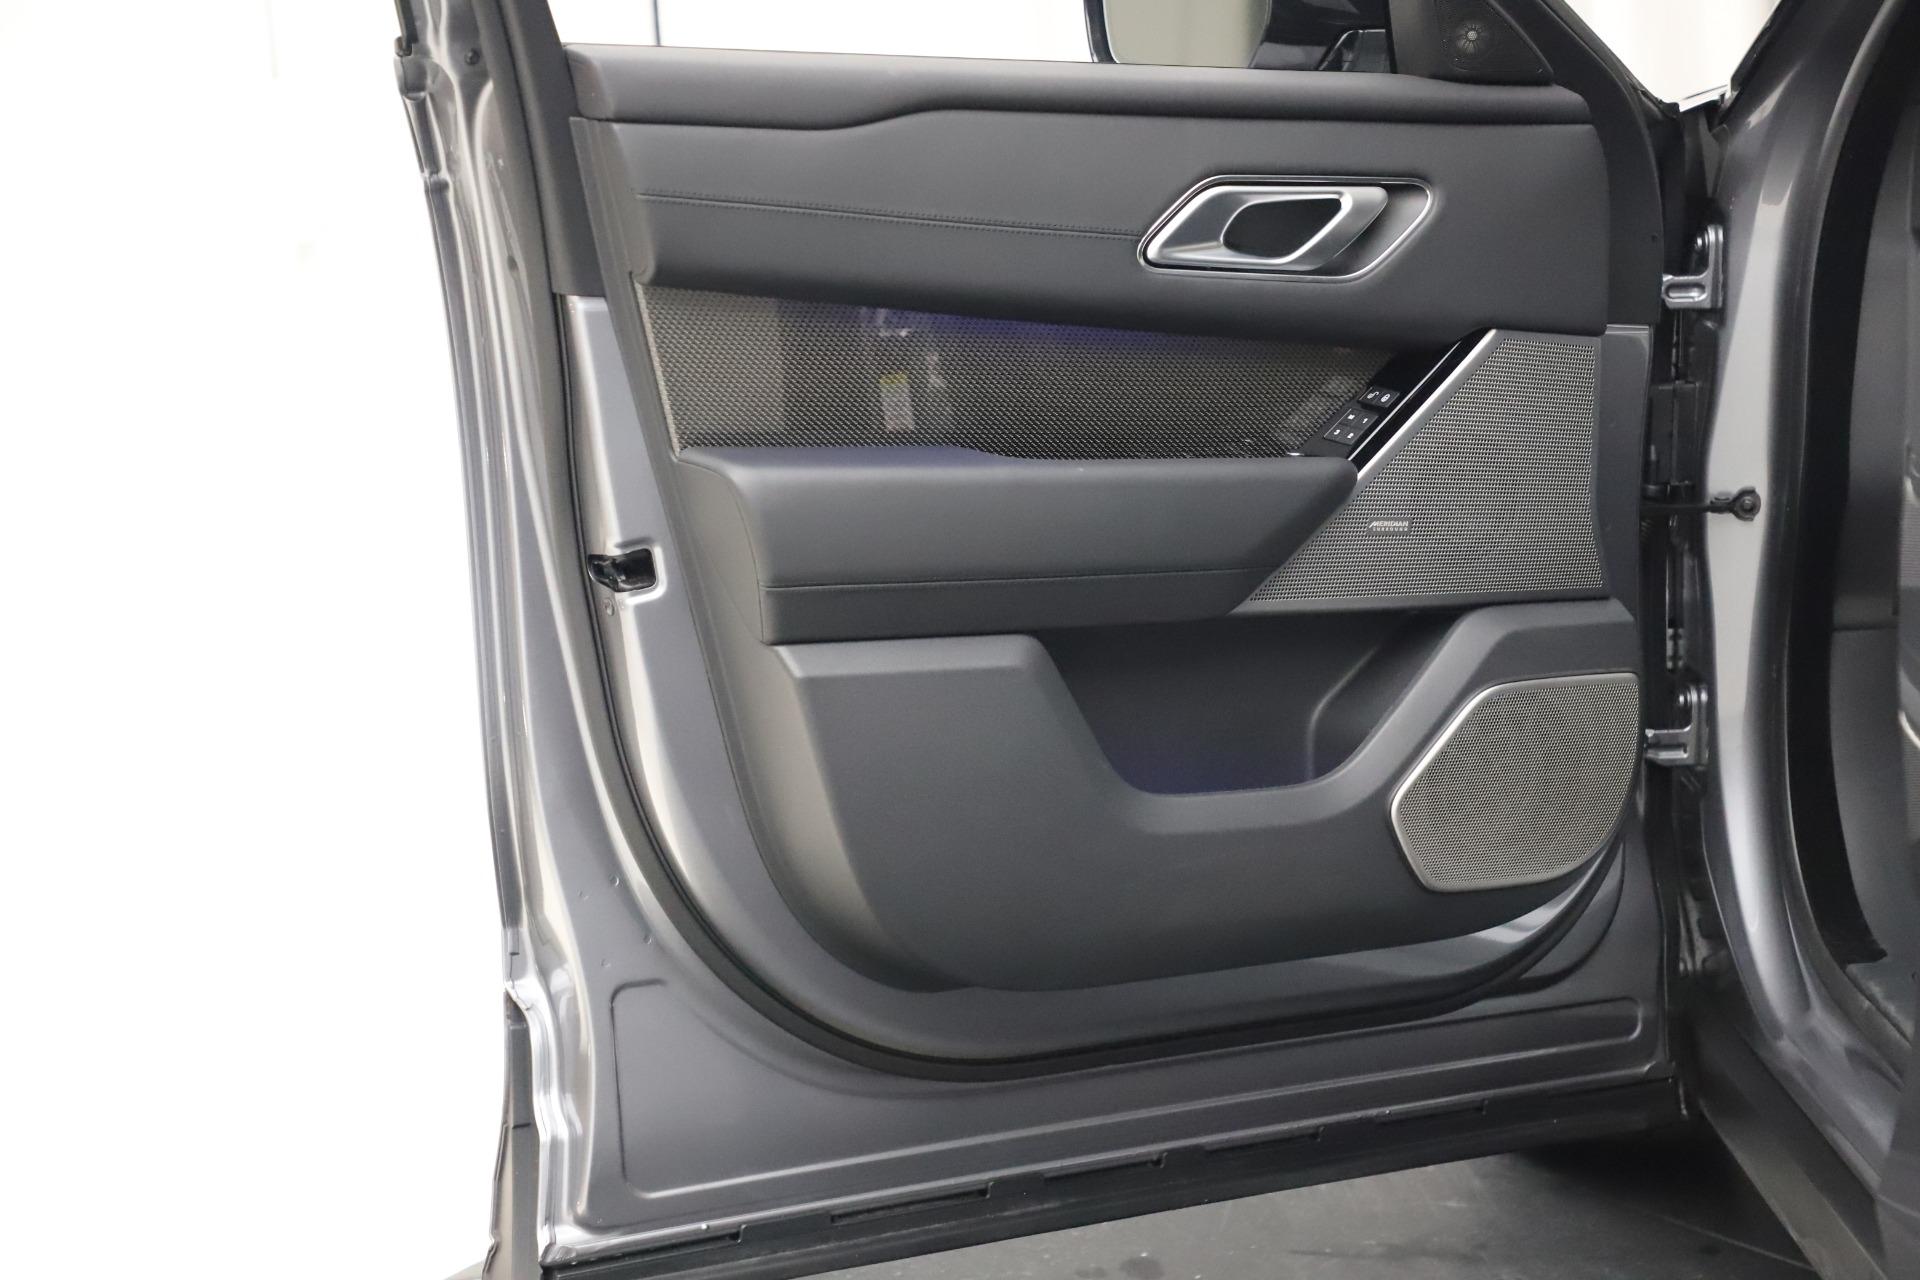 Used-2020-Land-Rover-Range-Rover-Velar-SVAutobiography-Dynamic-Edition